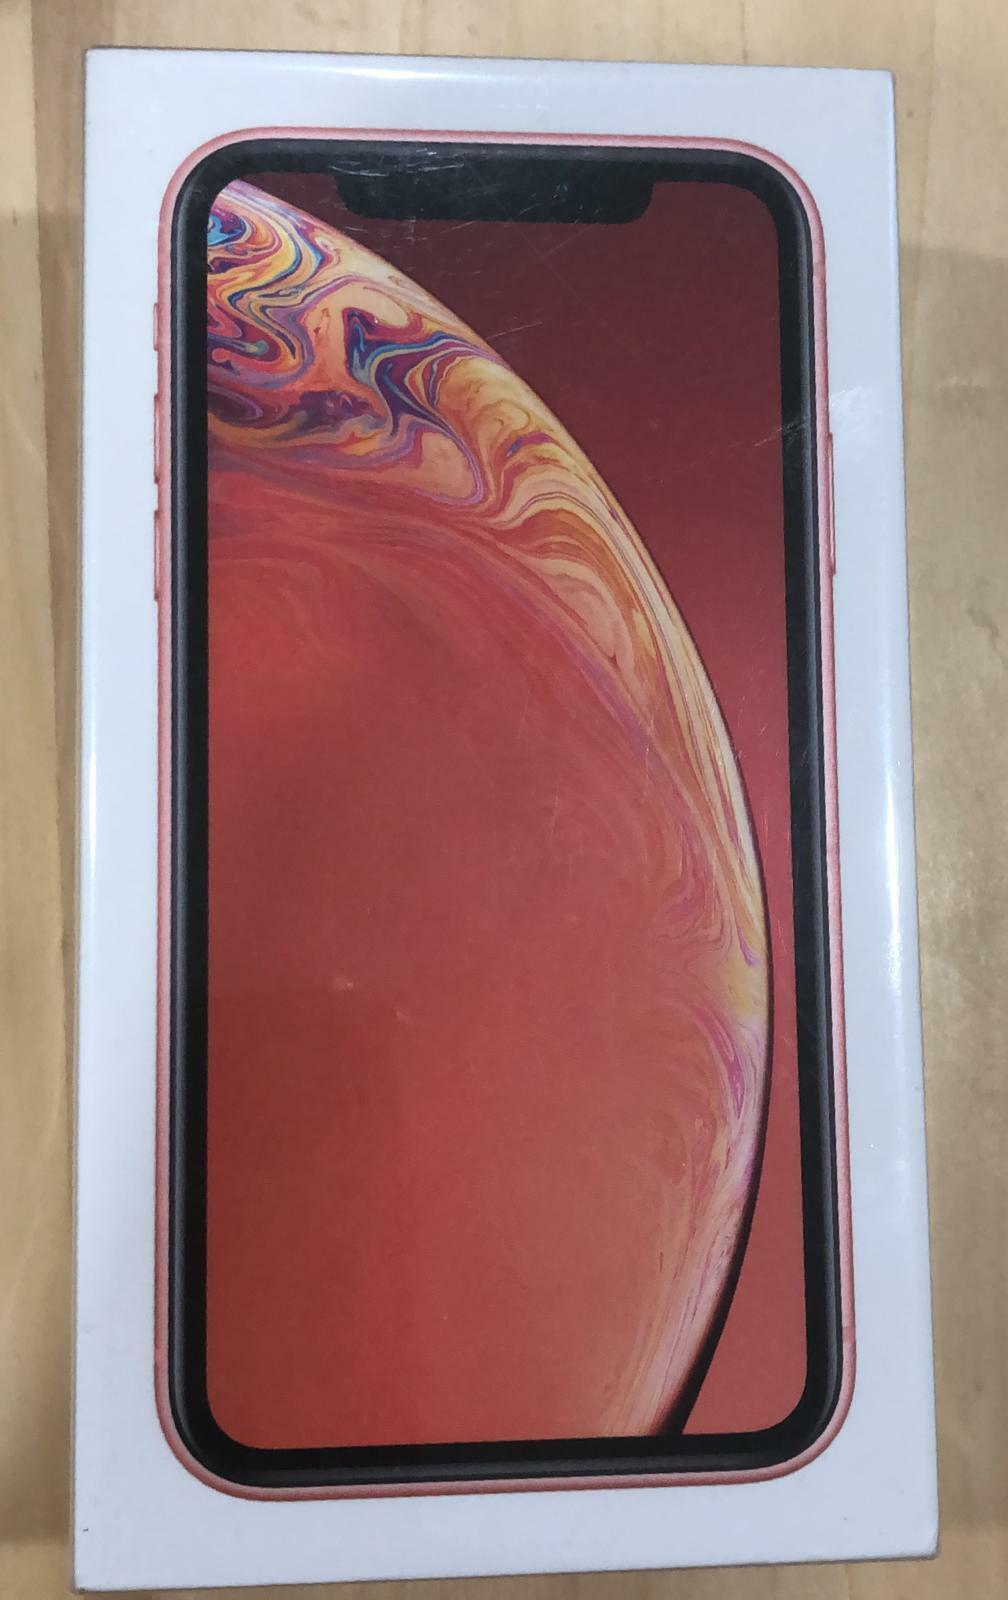 NEW SEALED Apple iPhone XR 128GB Coral (FACTORY UNLOCKED)1 Yr APPLE WARRANTY!